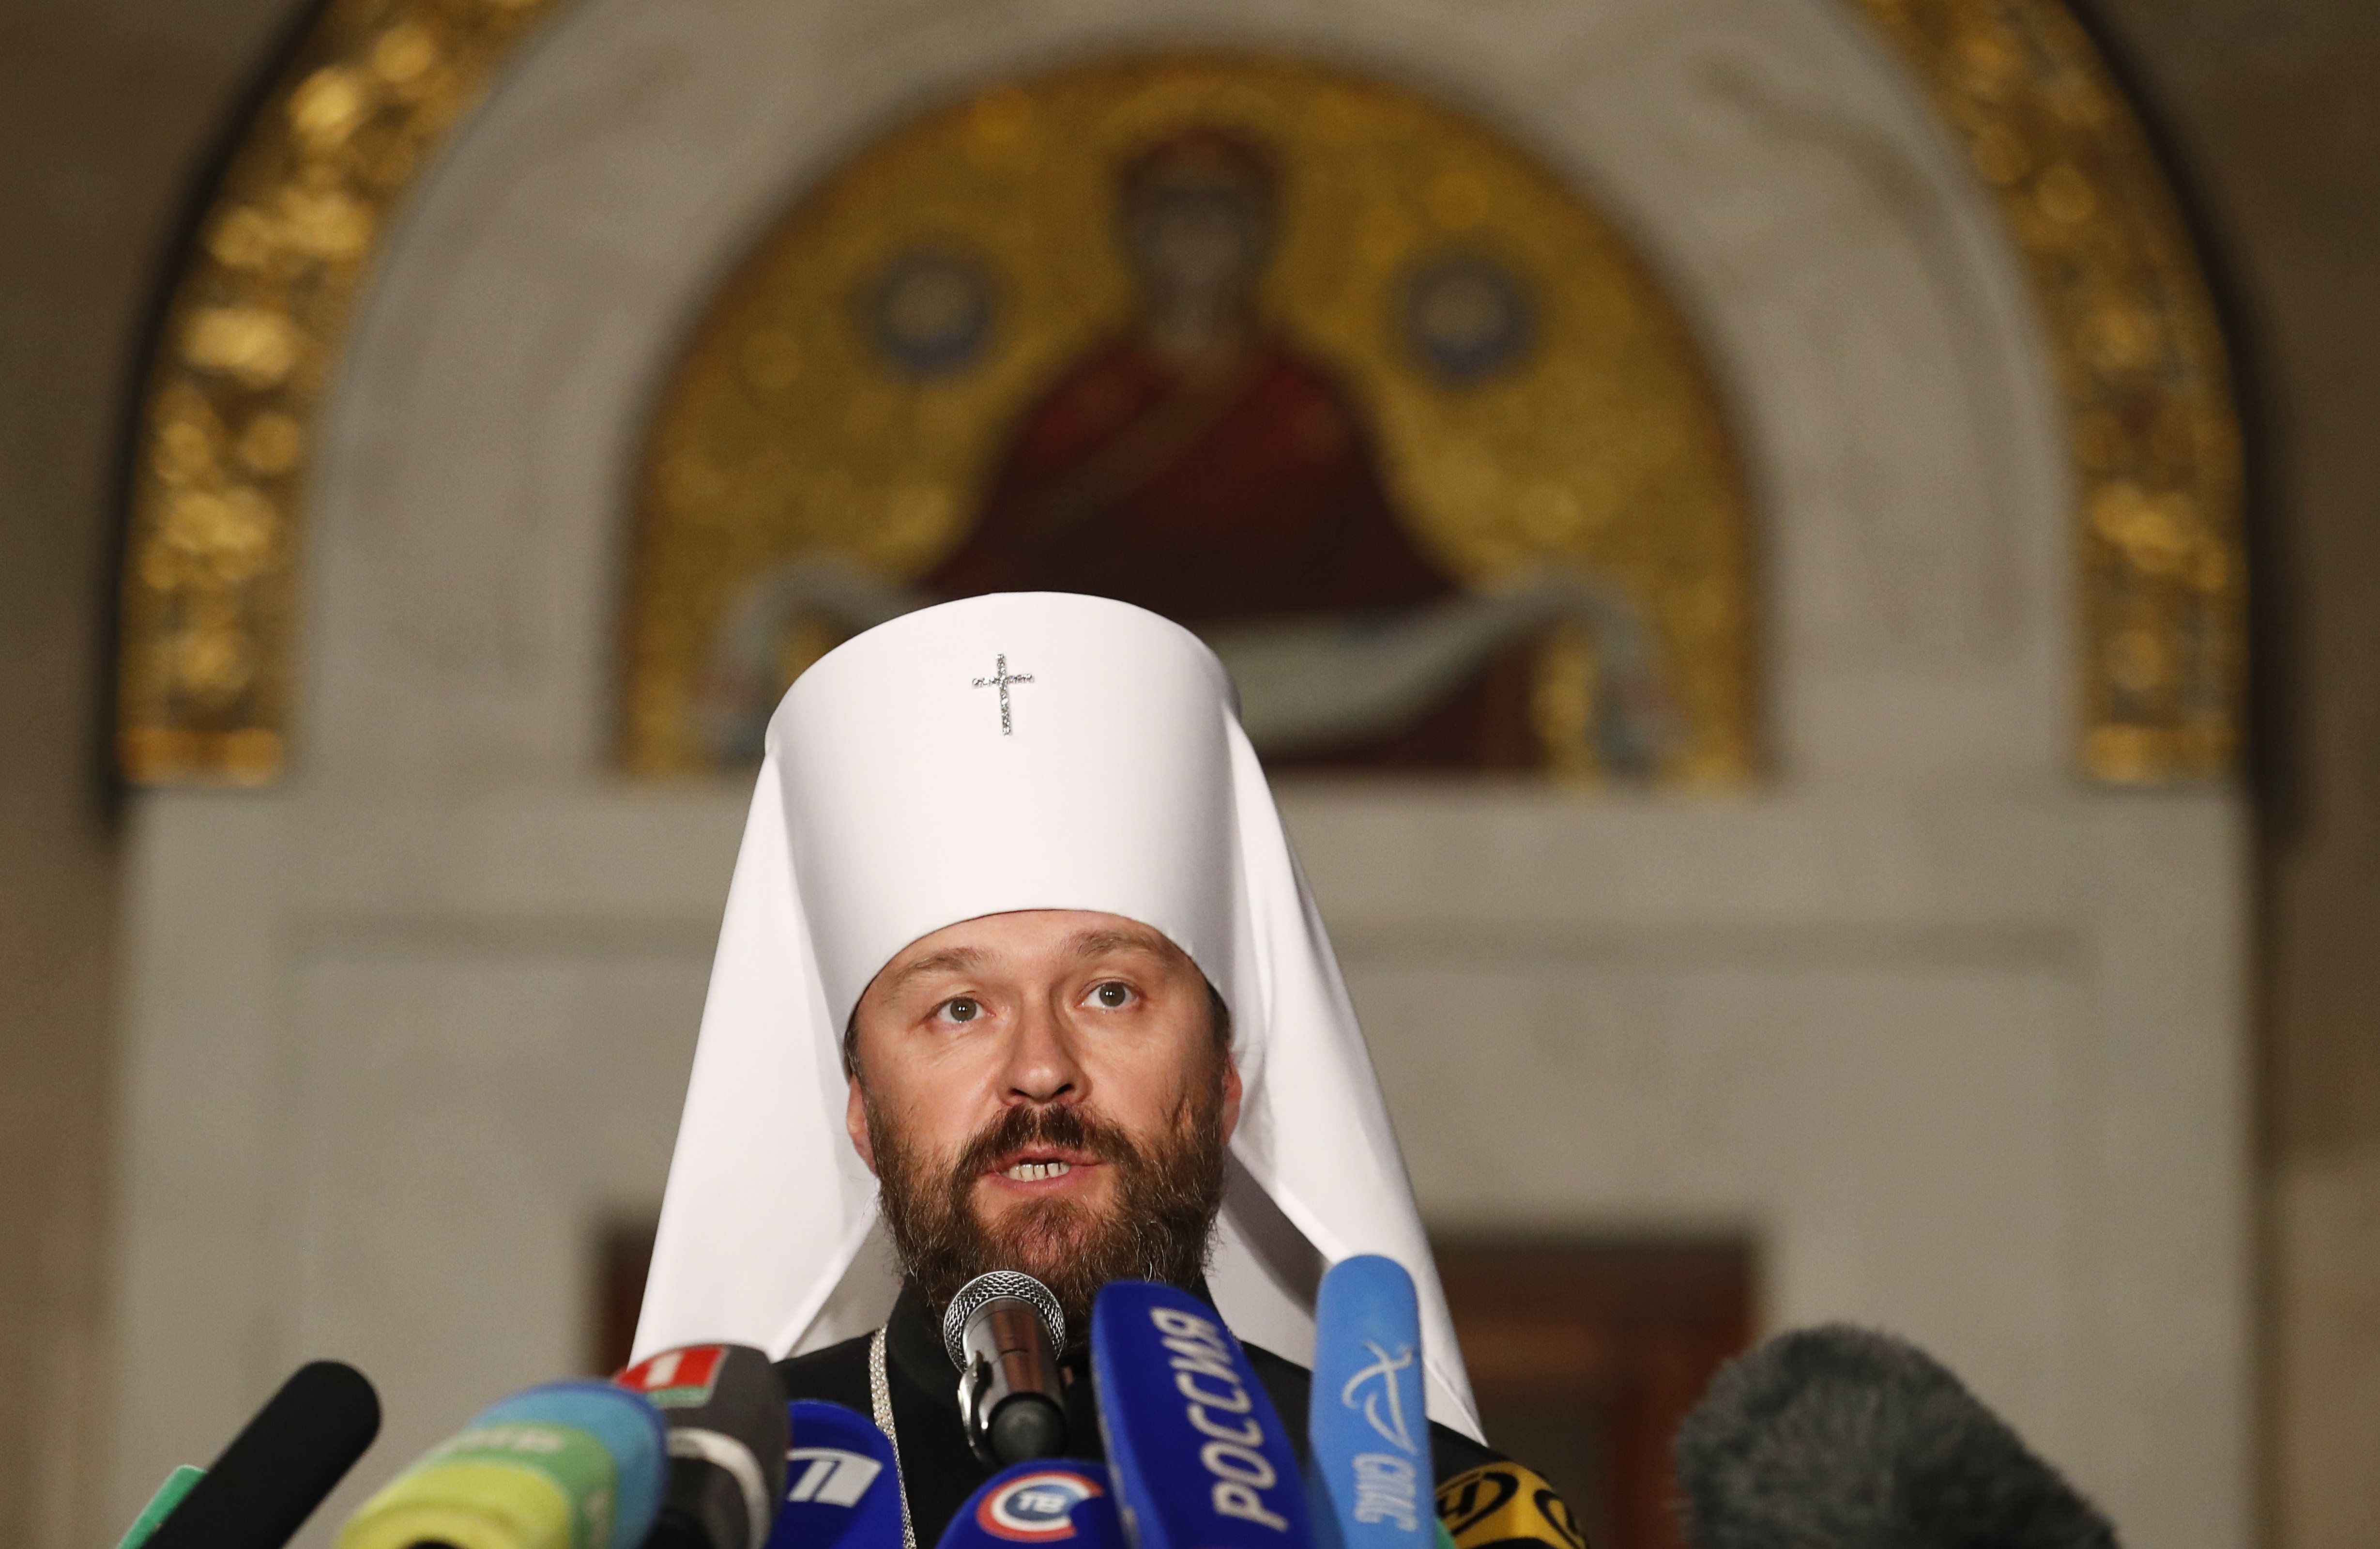 CHURCHES AMONG THE BIRCHES: RUSSIA VS UKRAINE